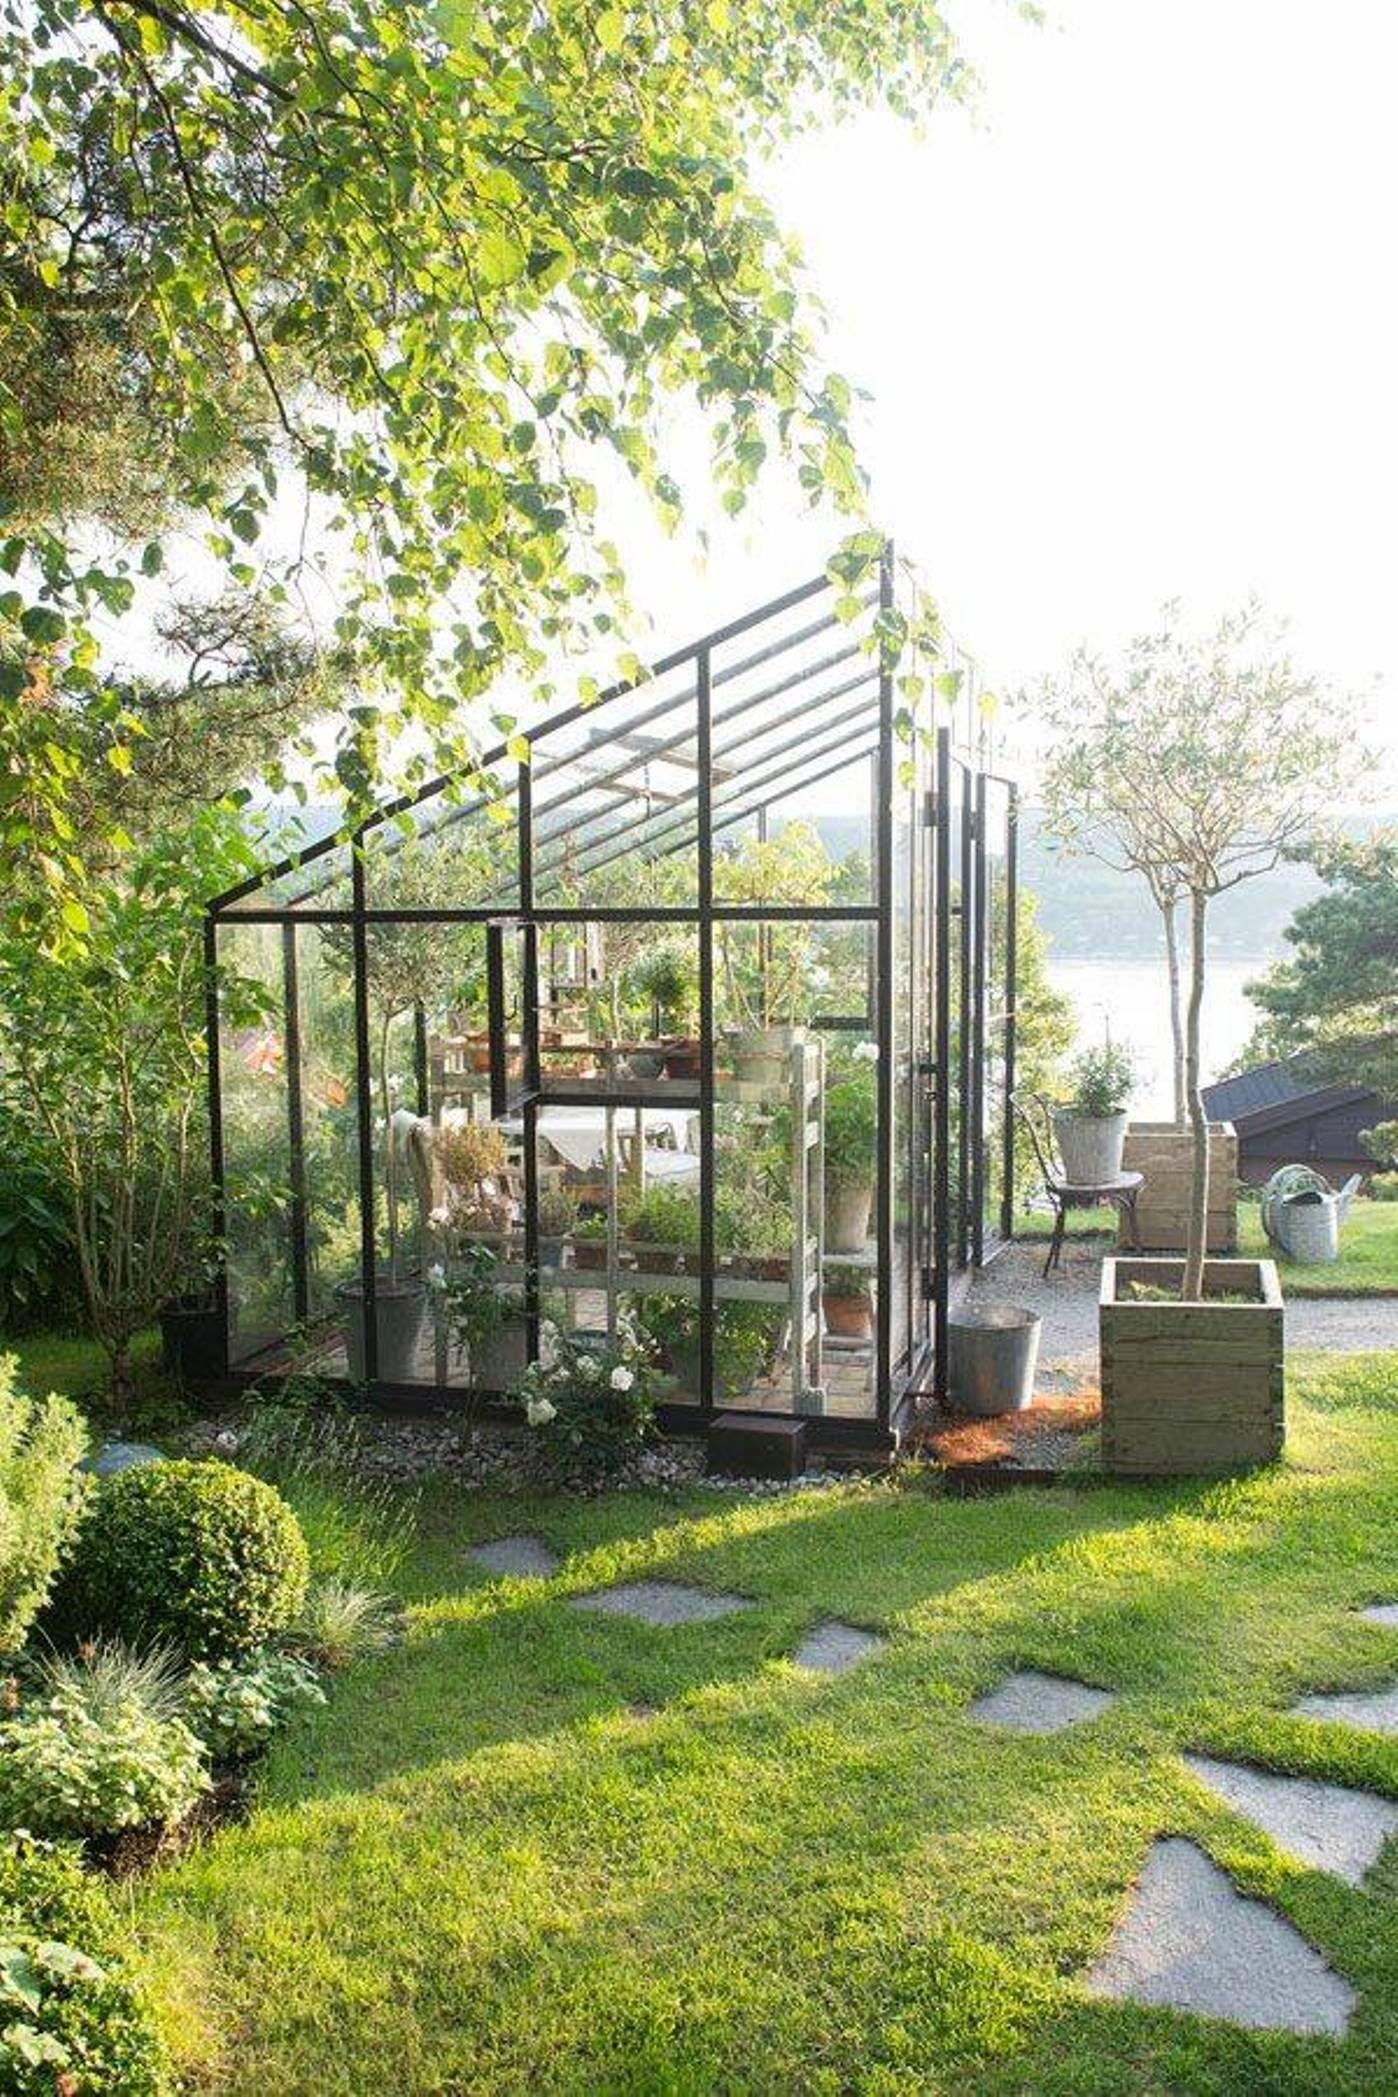 Moderne • VERRIÈRE • JARDIN D\'HIVER • VERANDA • | plantes | Serre ...